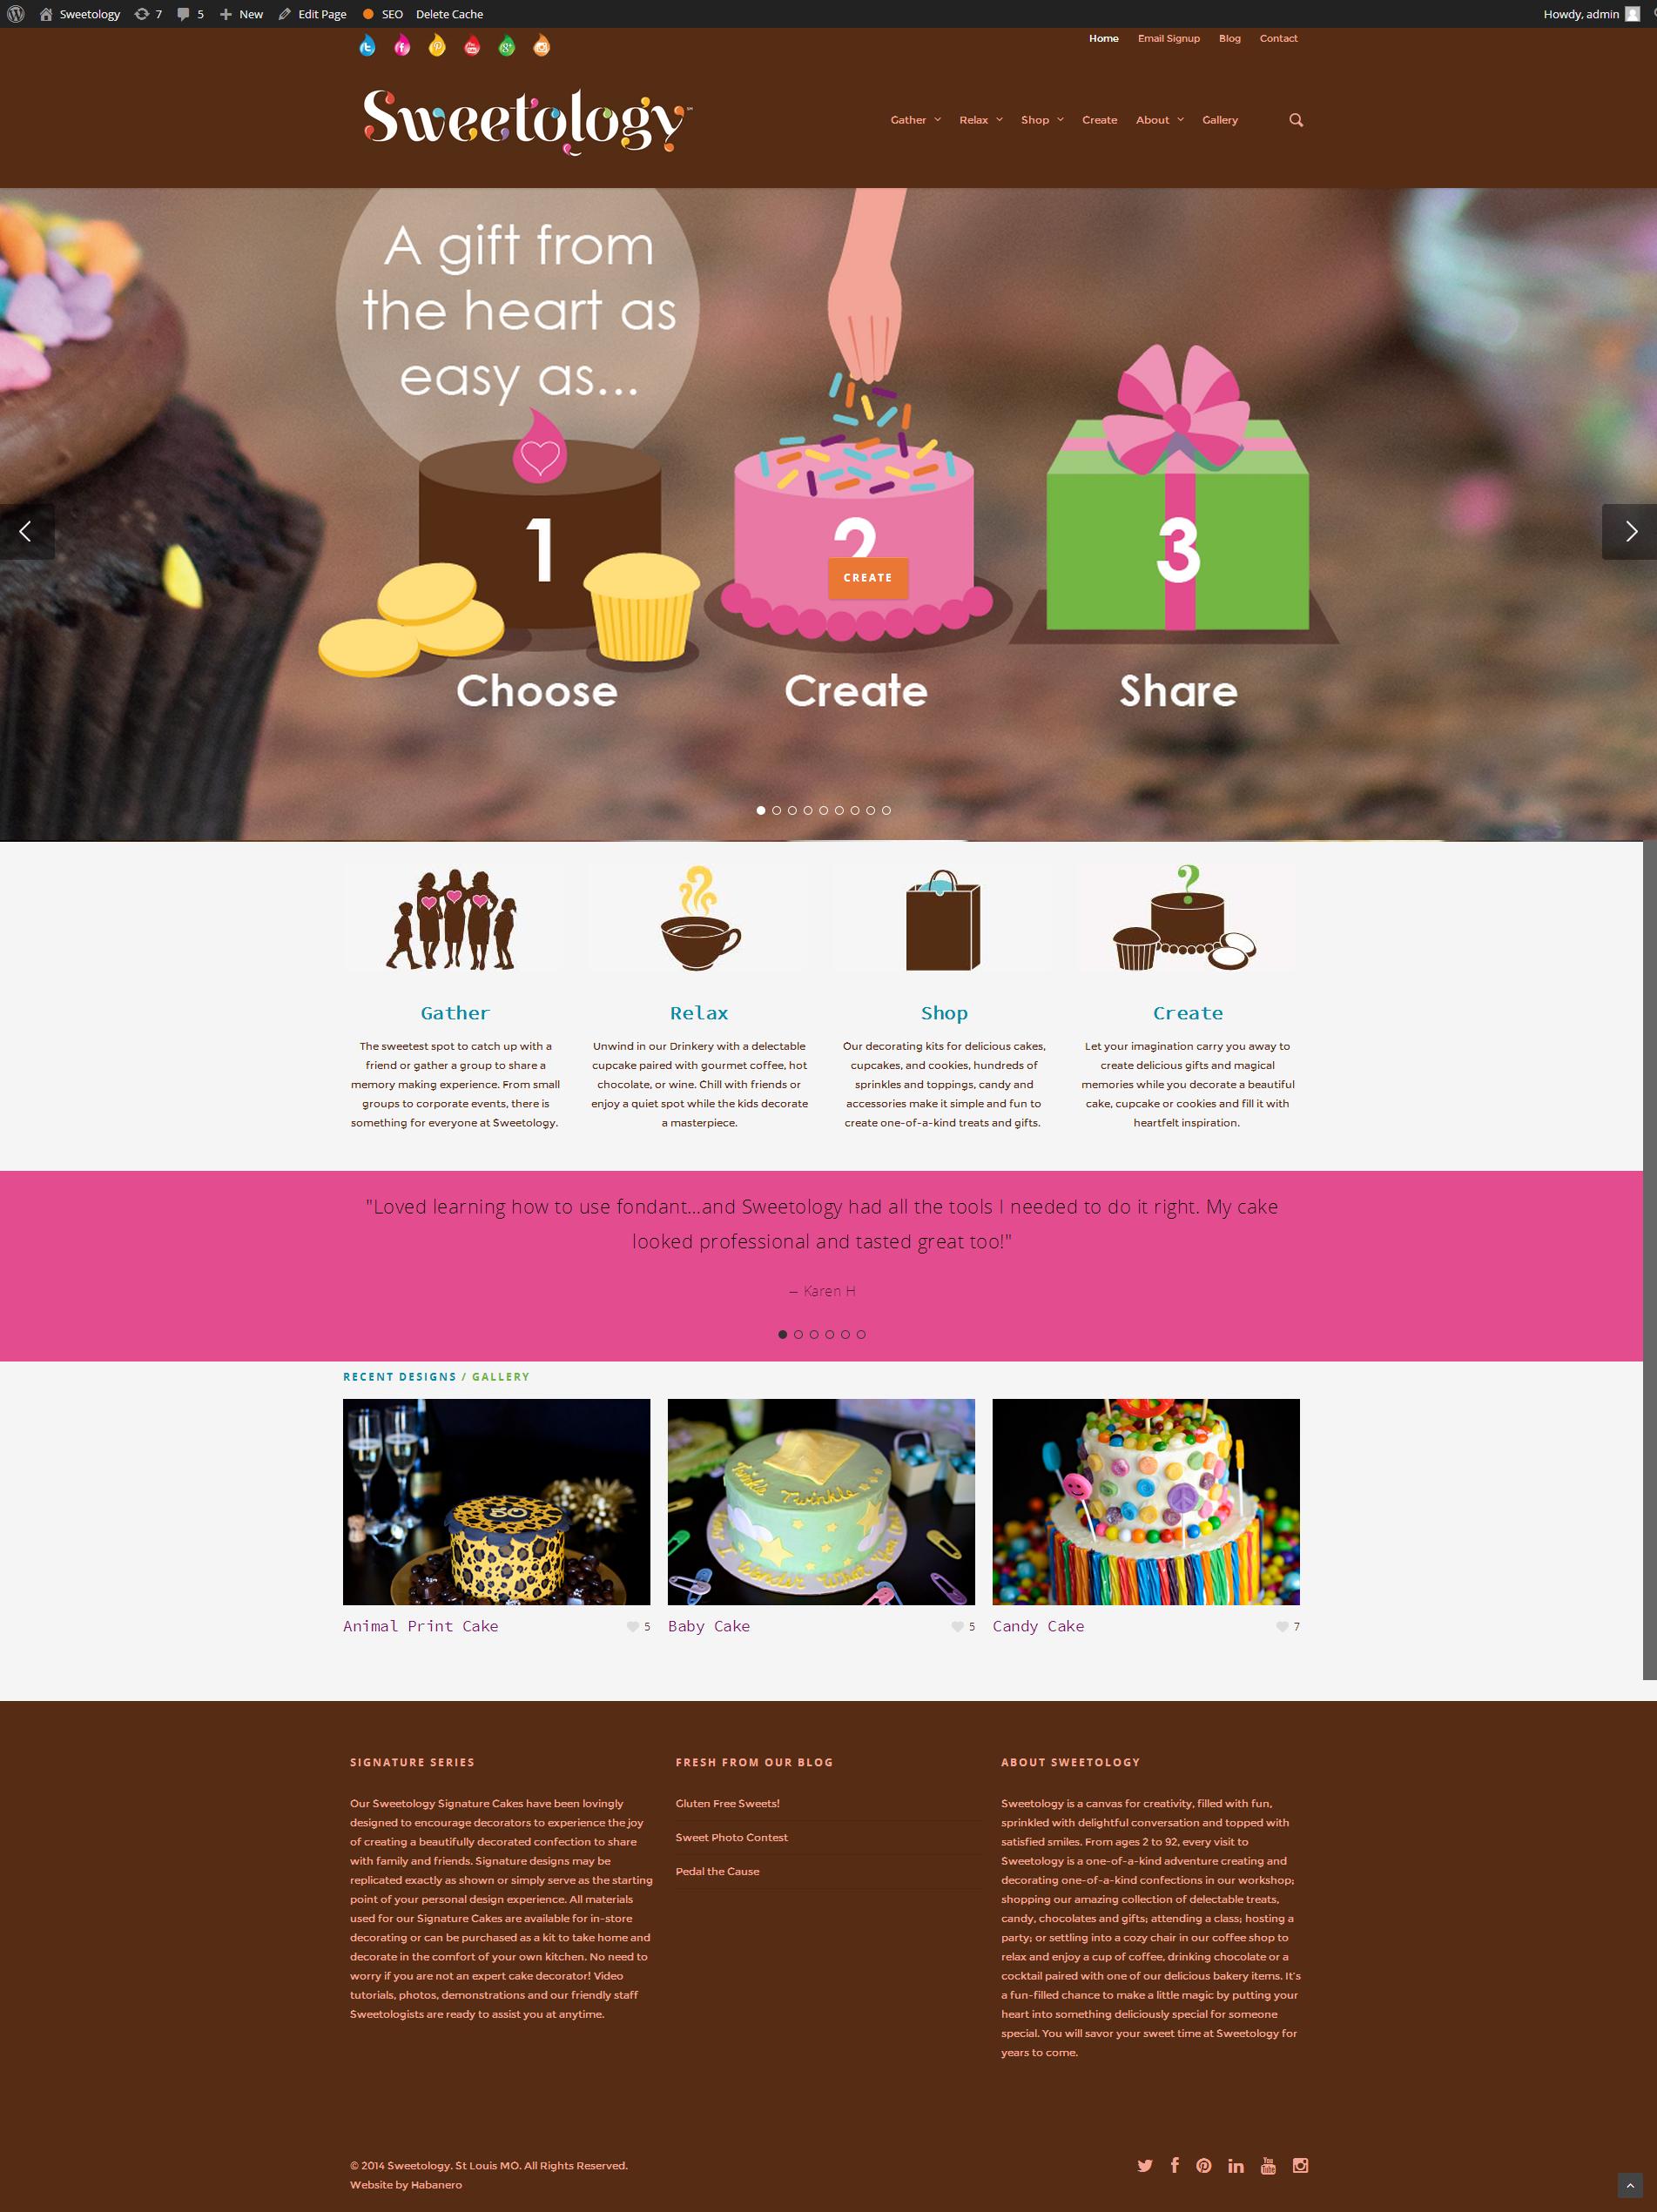 Sweetology Wordpress Site E Commerce Habanero St Louis Digital Marketing Agency Web Design Web Applications Mobile Applications Social Media